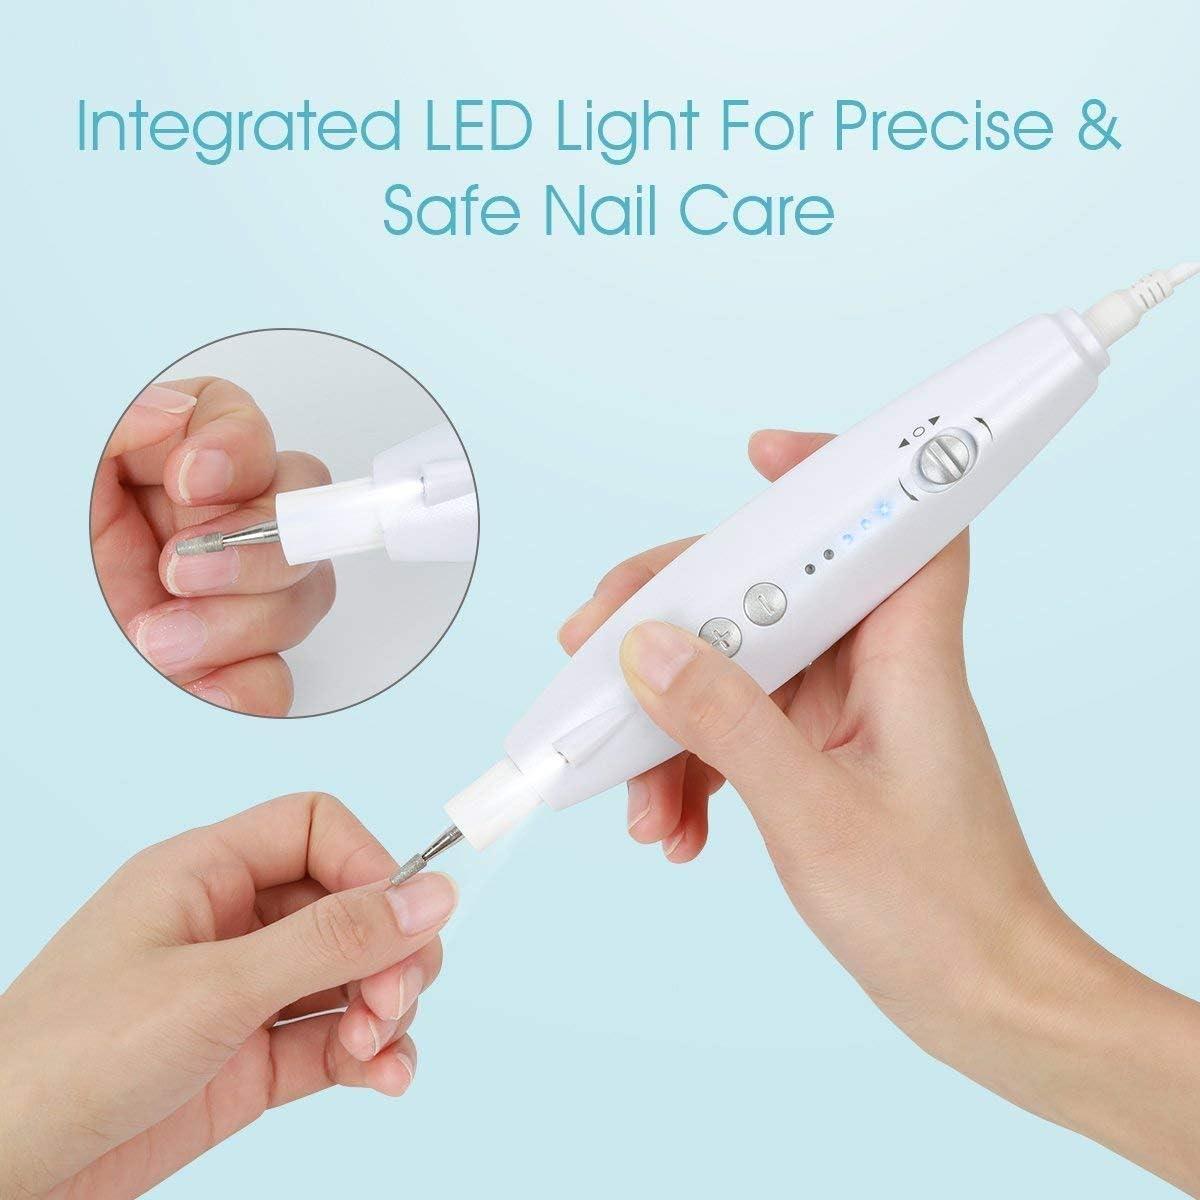 BEAUTURAL Kit de Manicura y Pedicura Eléctrico Profesional, Potente Lima Manicura Pulidora para Uñas